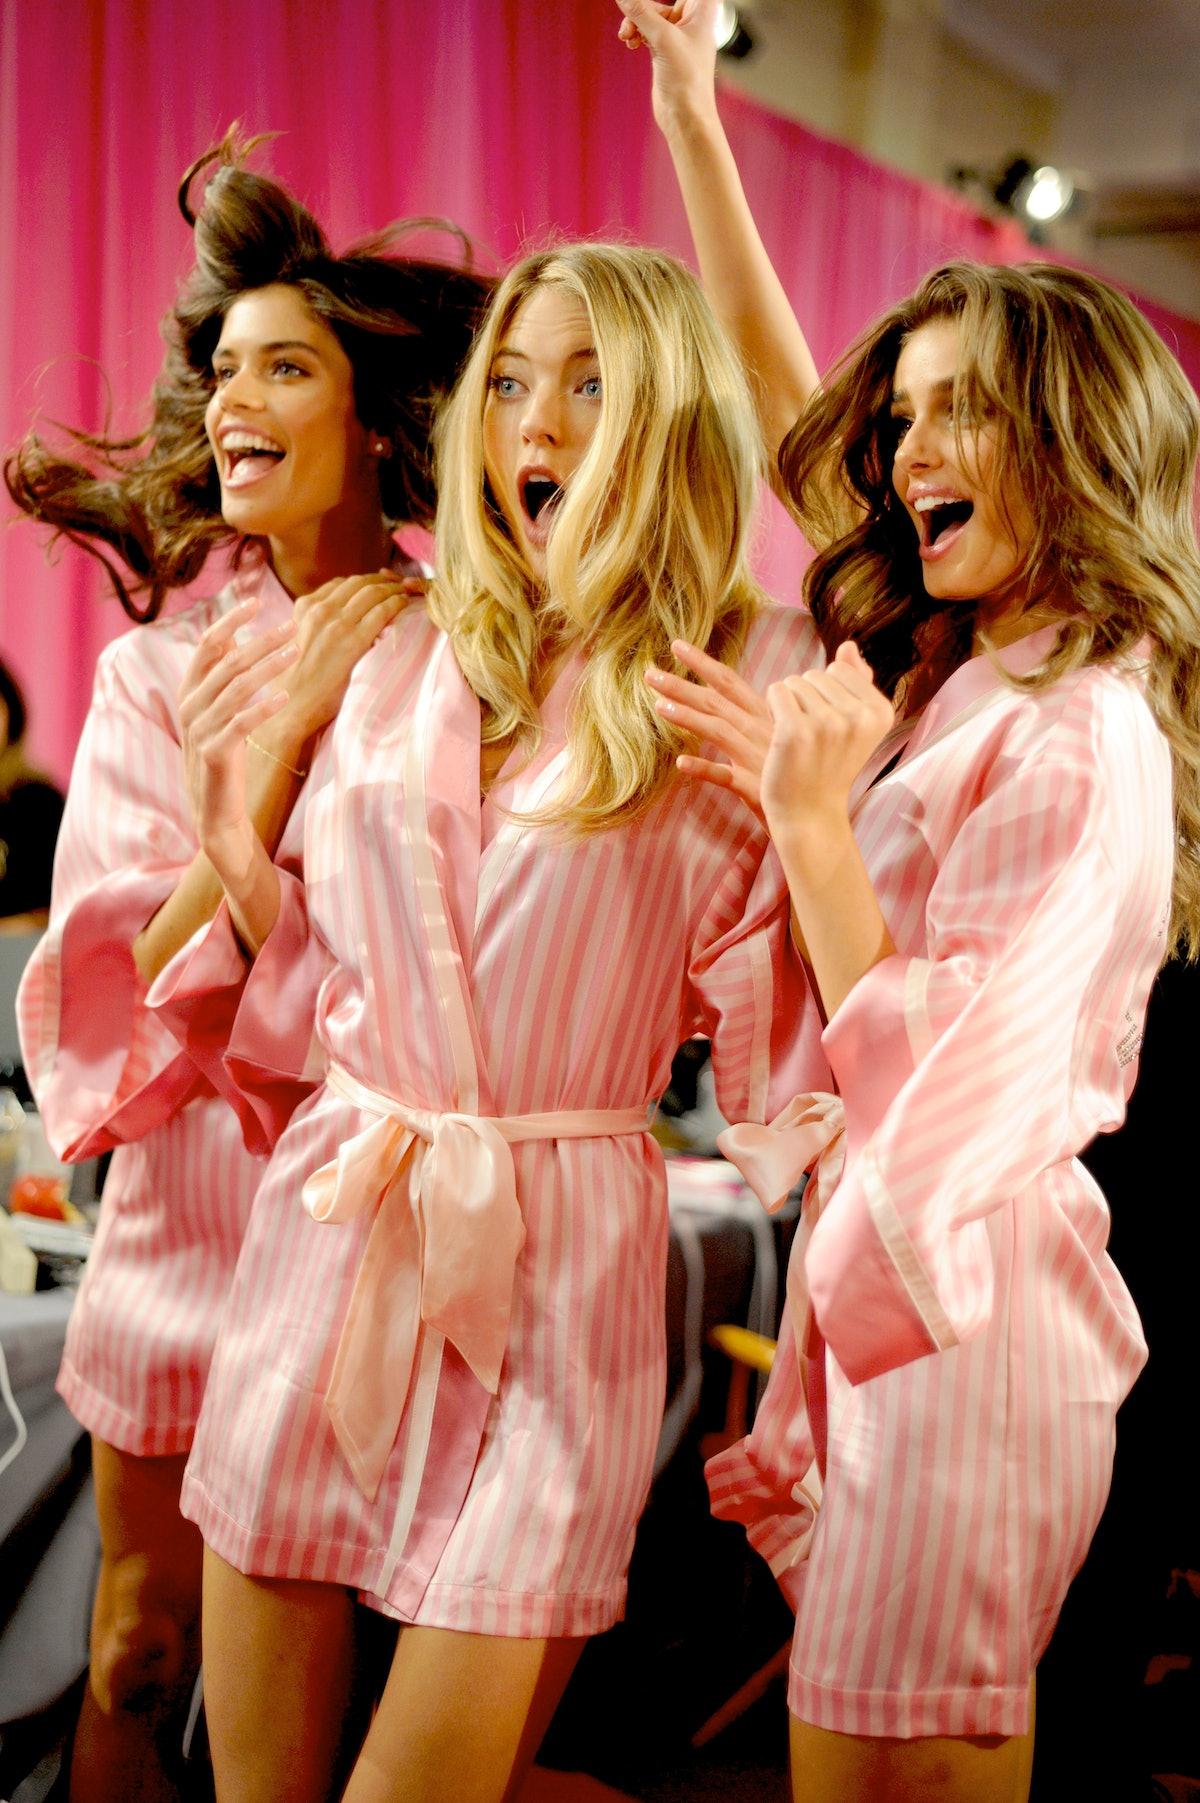 Backstage at the 2015 Victoria's Secret Fashion Show